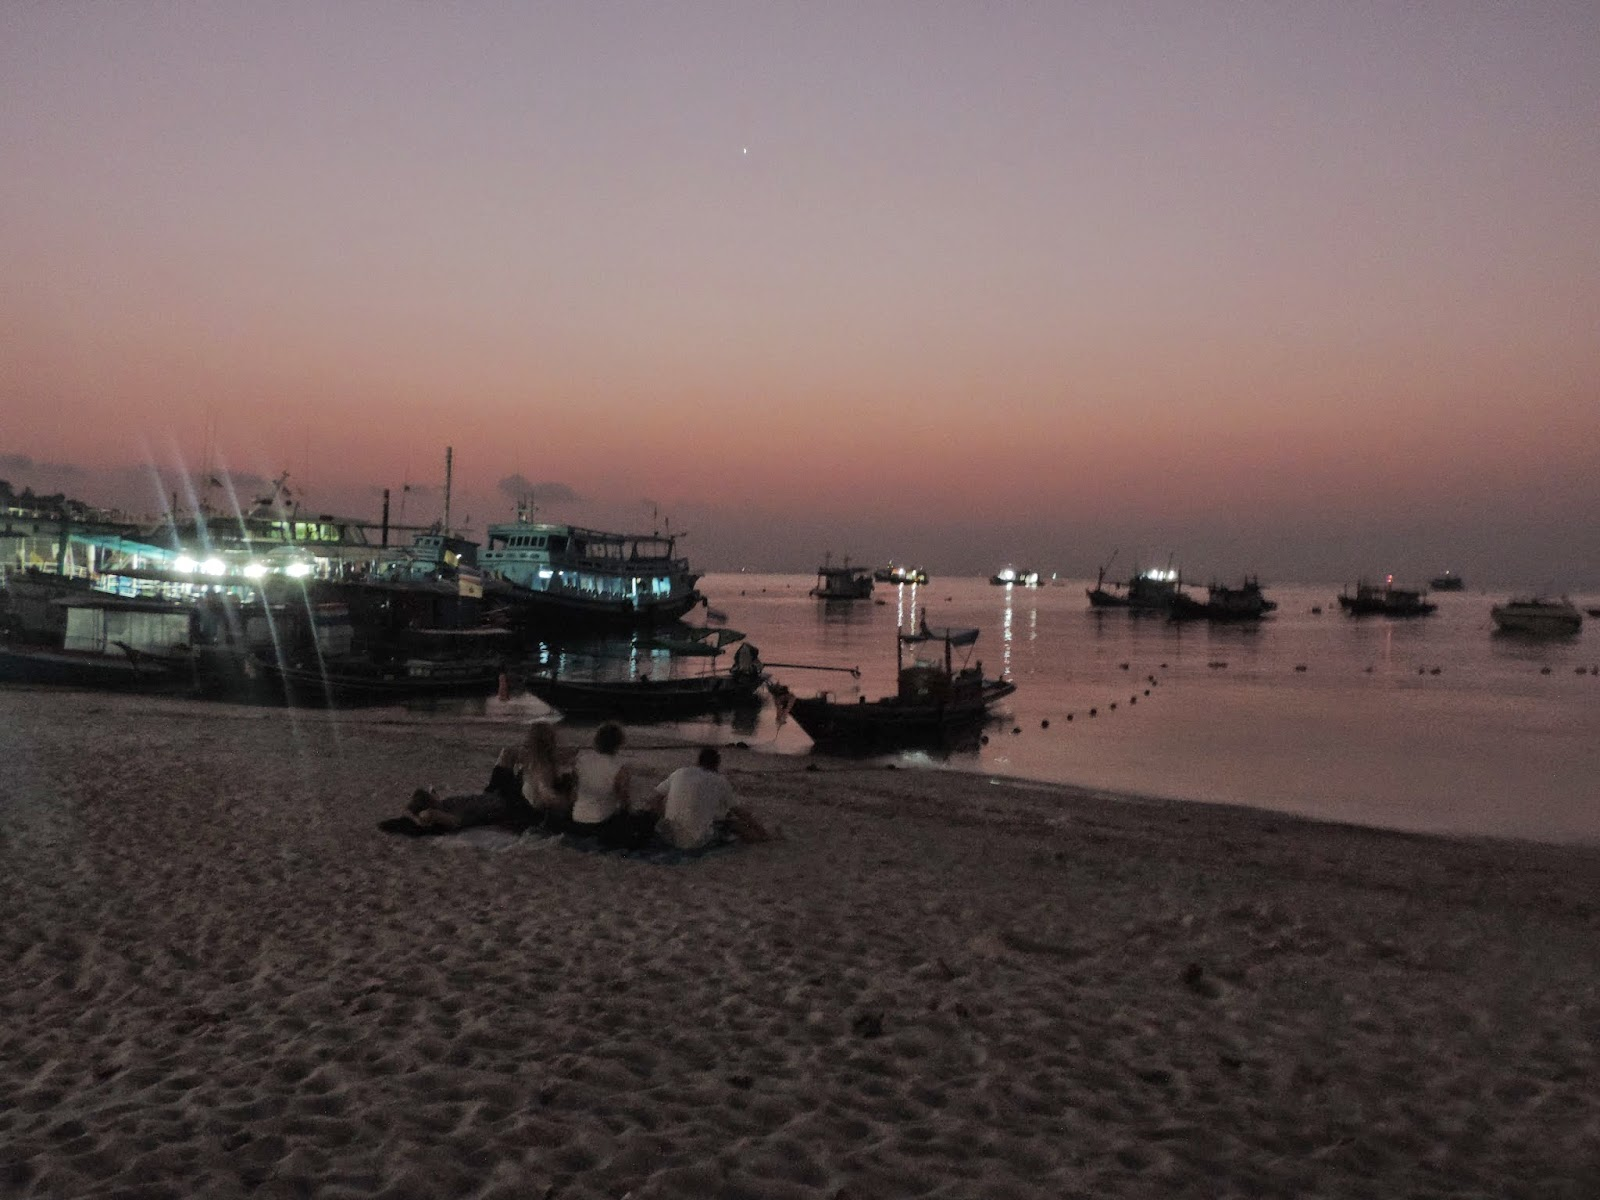 Tajska: Koh Tao